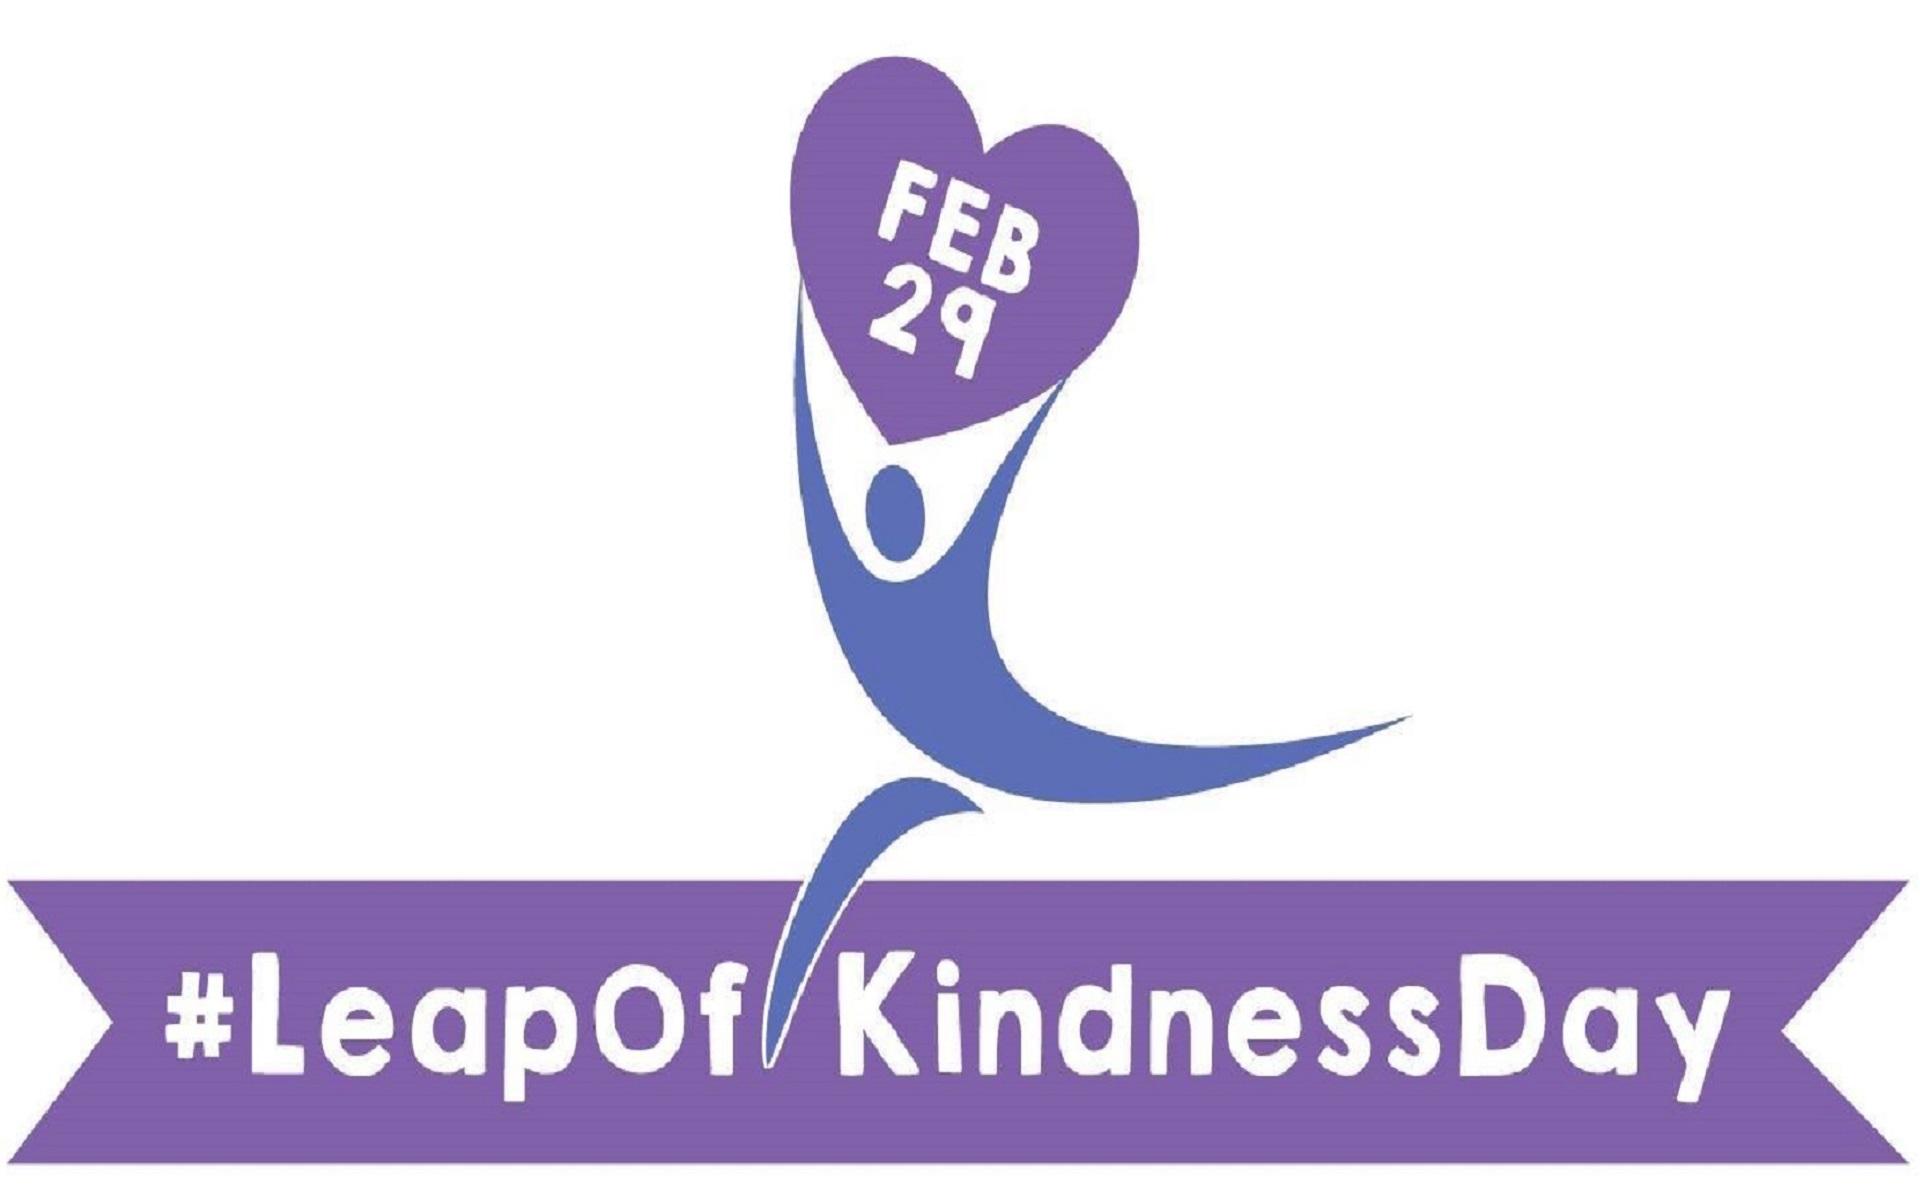 #LeapOfKindnessDay